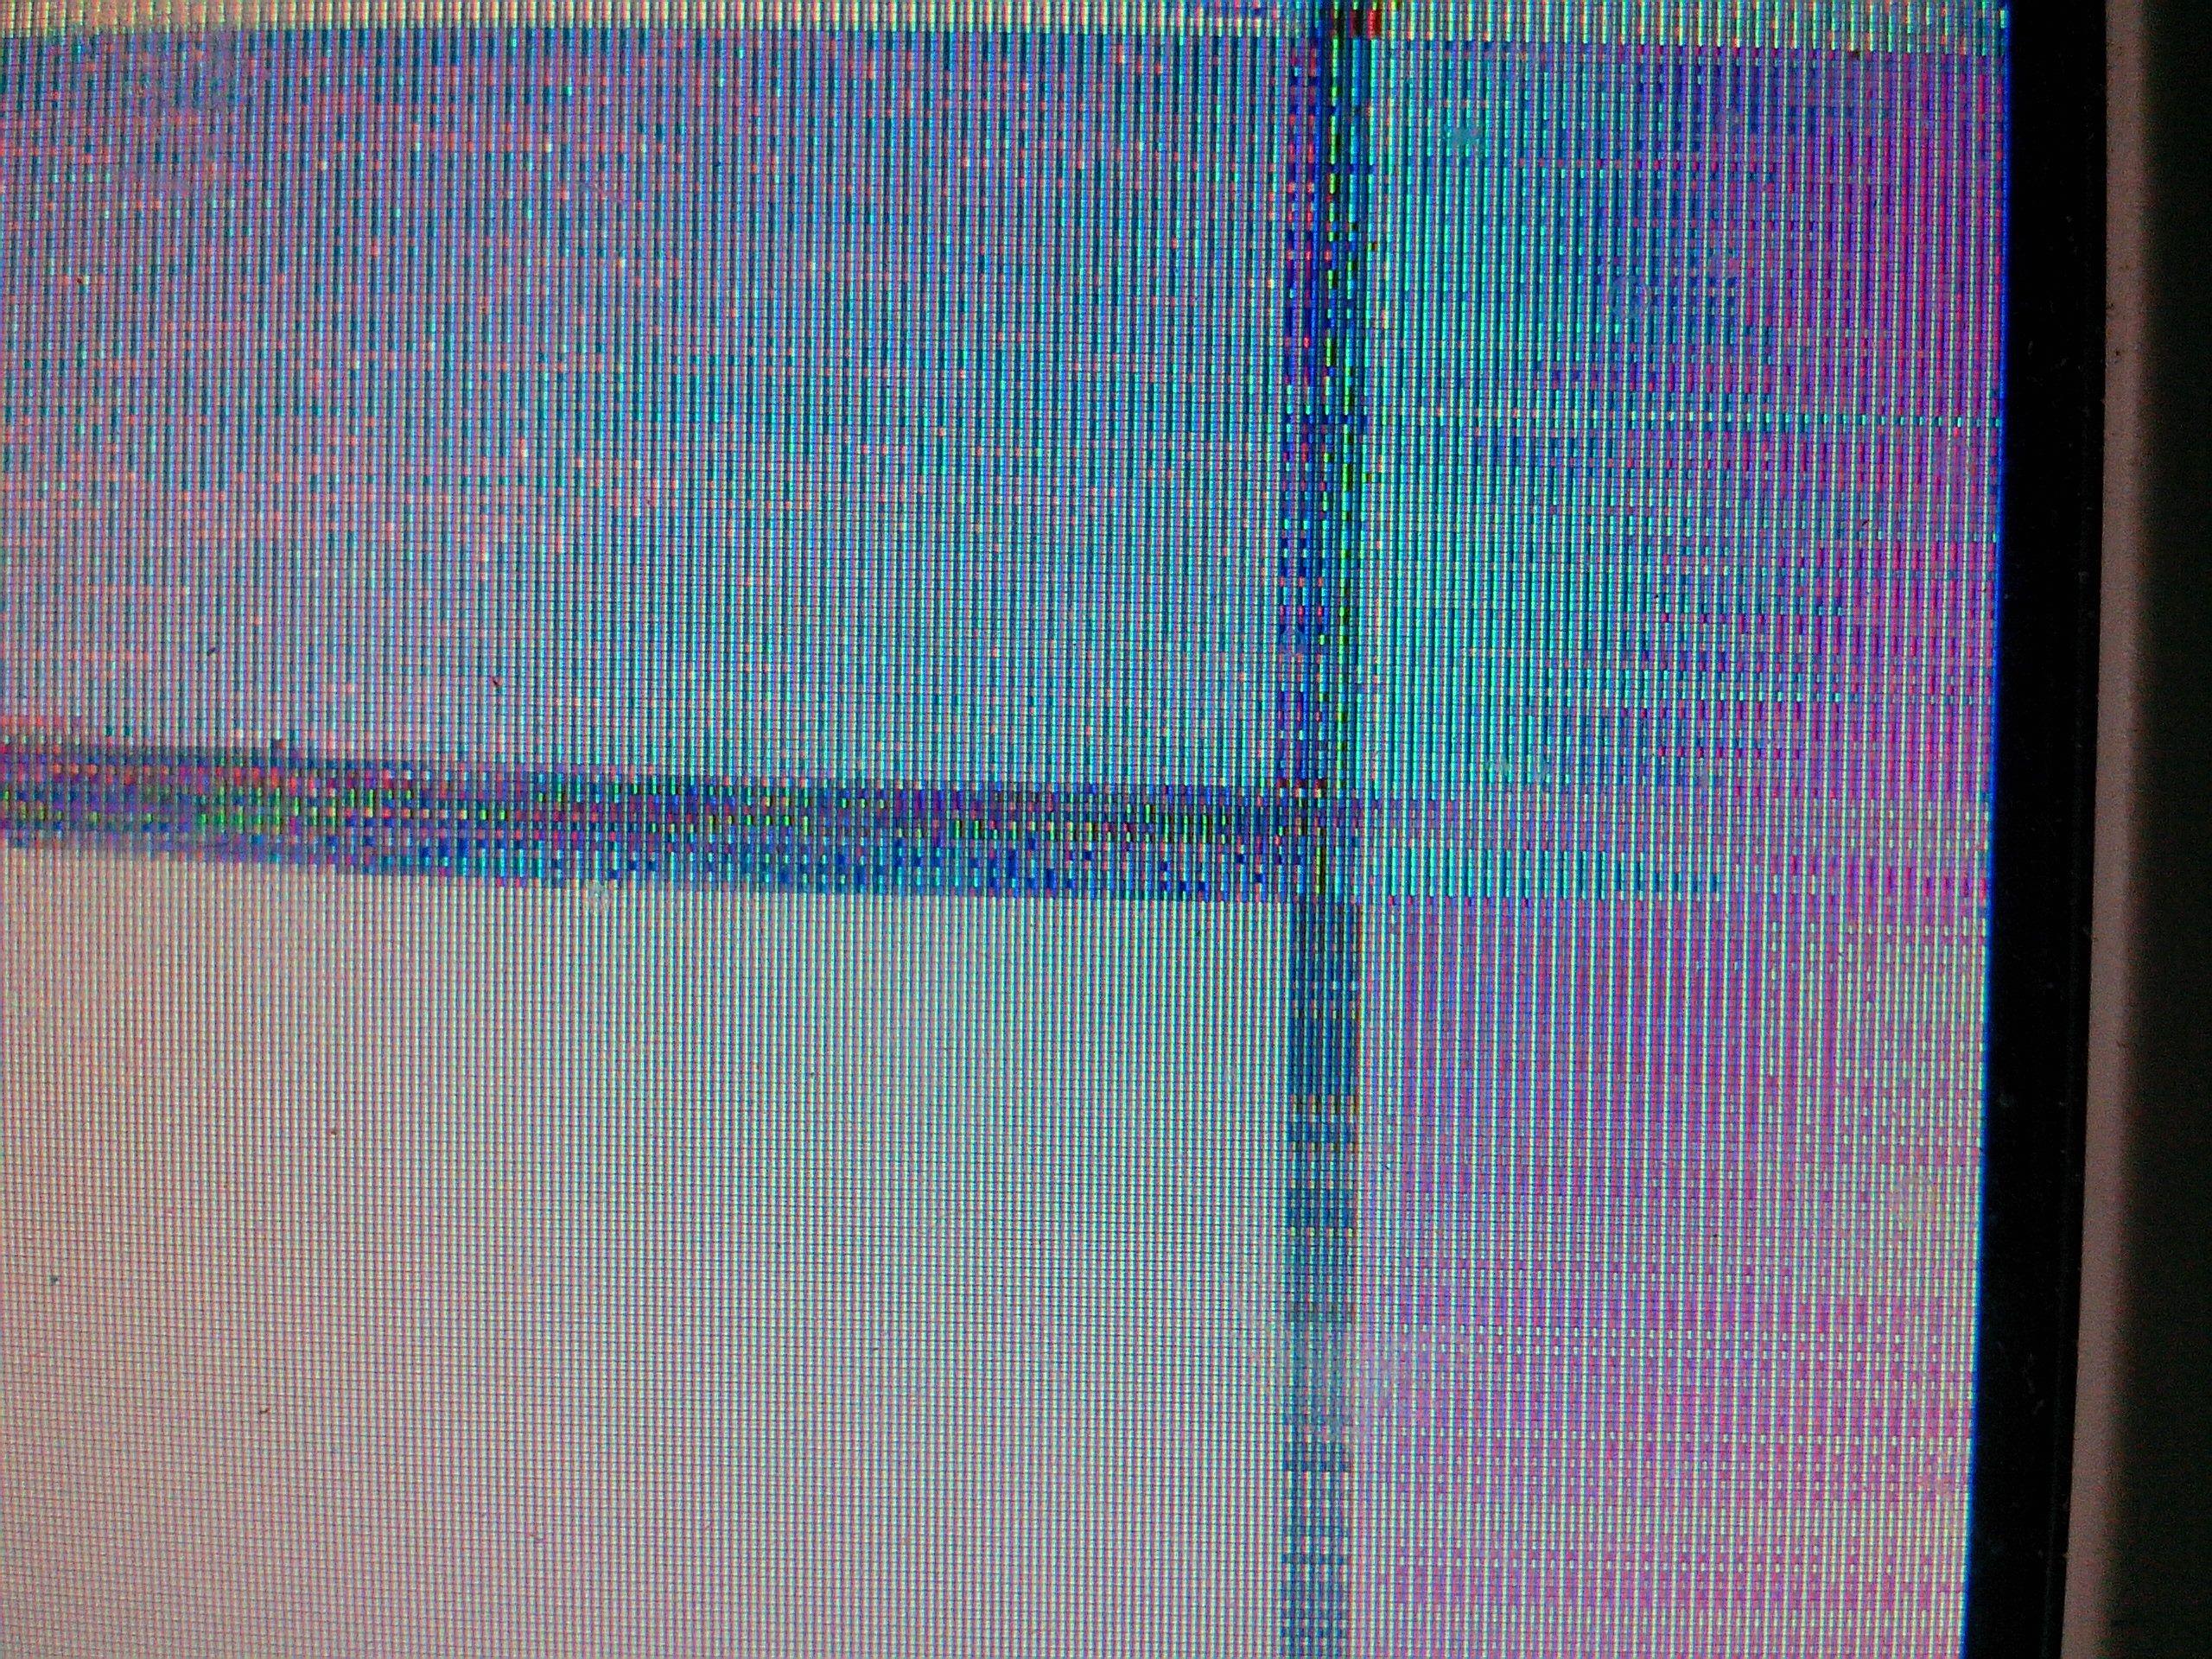 wacom手绘屏开机一段时间后屏幕会变花 是液晶屏本身的原高清图片